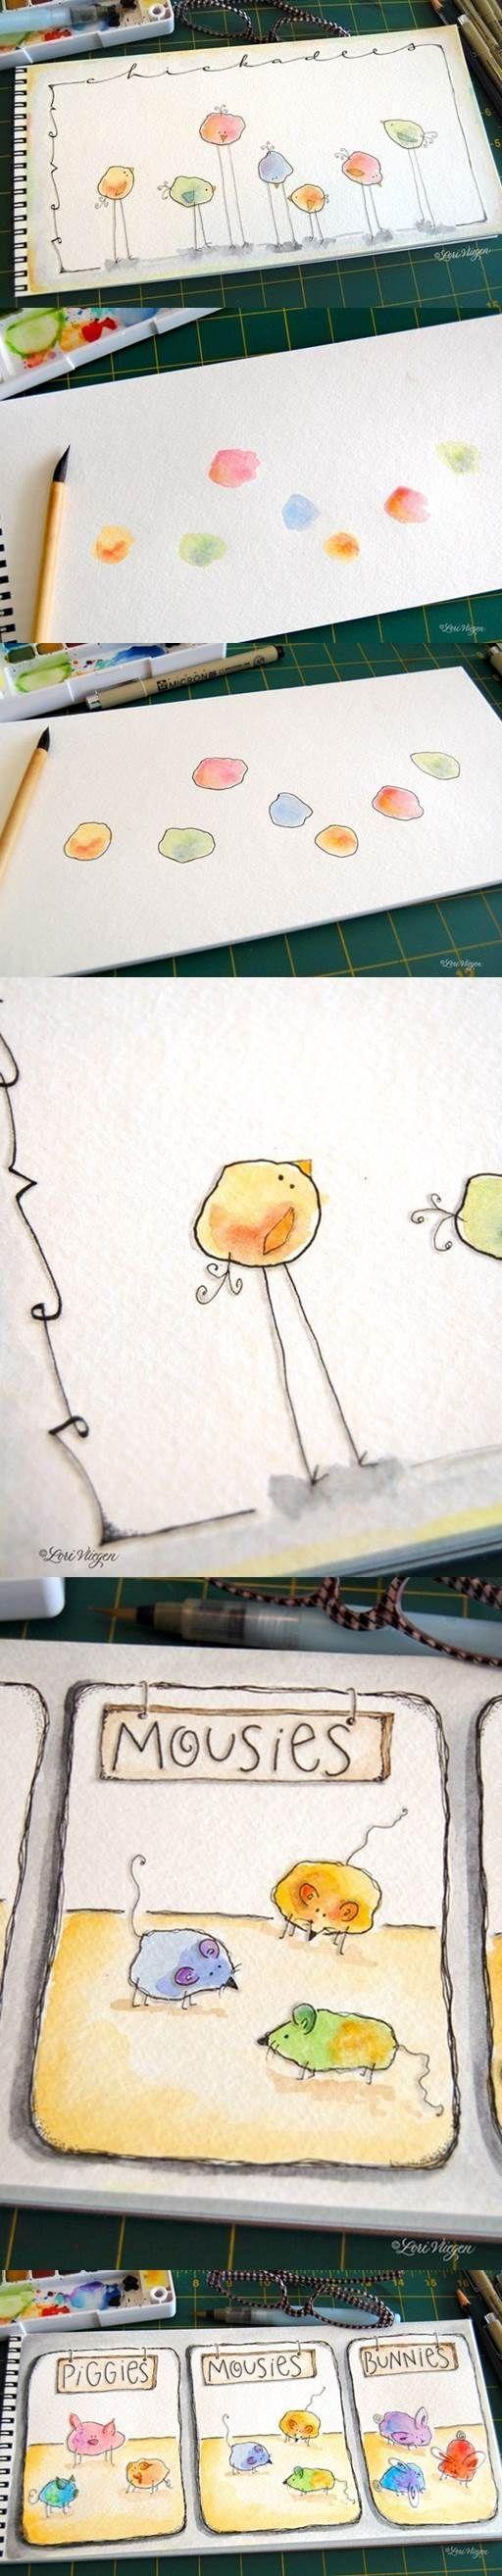 Creative Ways to Draw Funny Birds   iCreativeIdeas.com LIKE Us on Facebook ==> https://www.facebook.com/icreativeideas